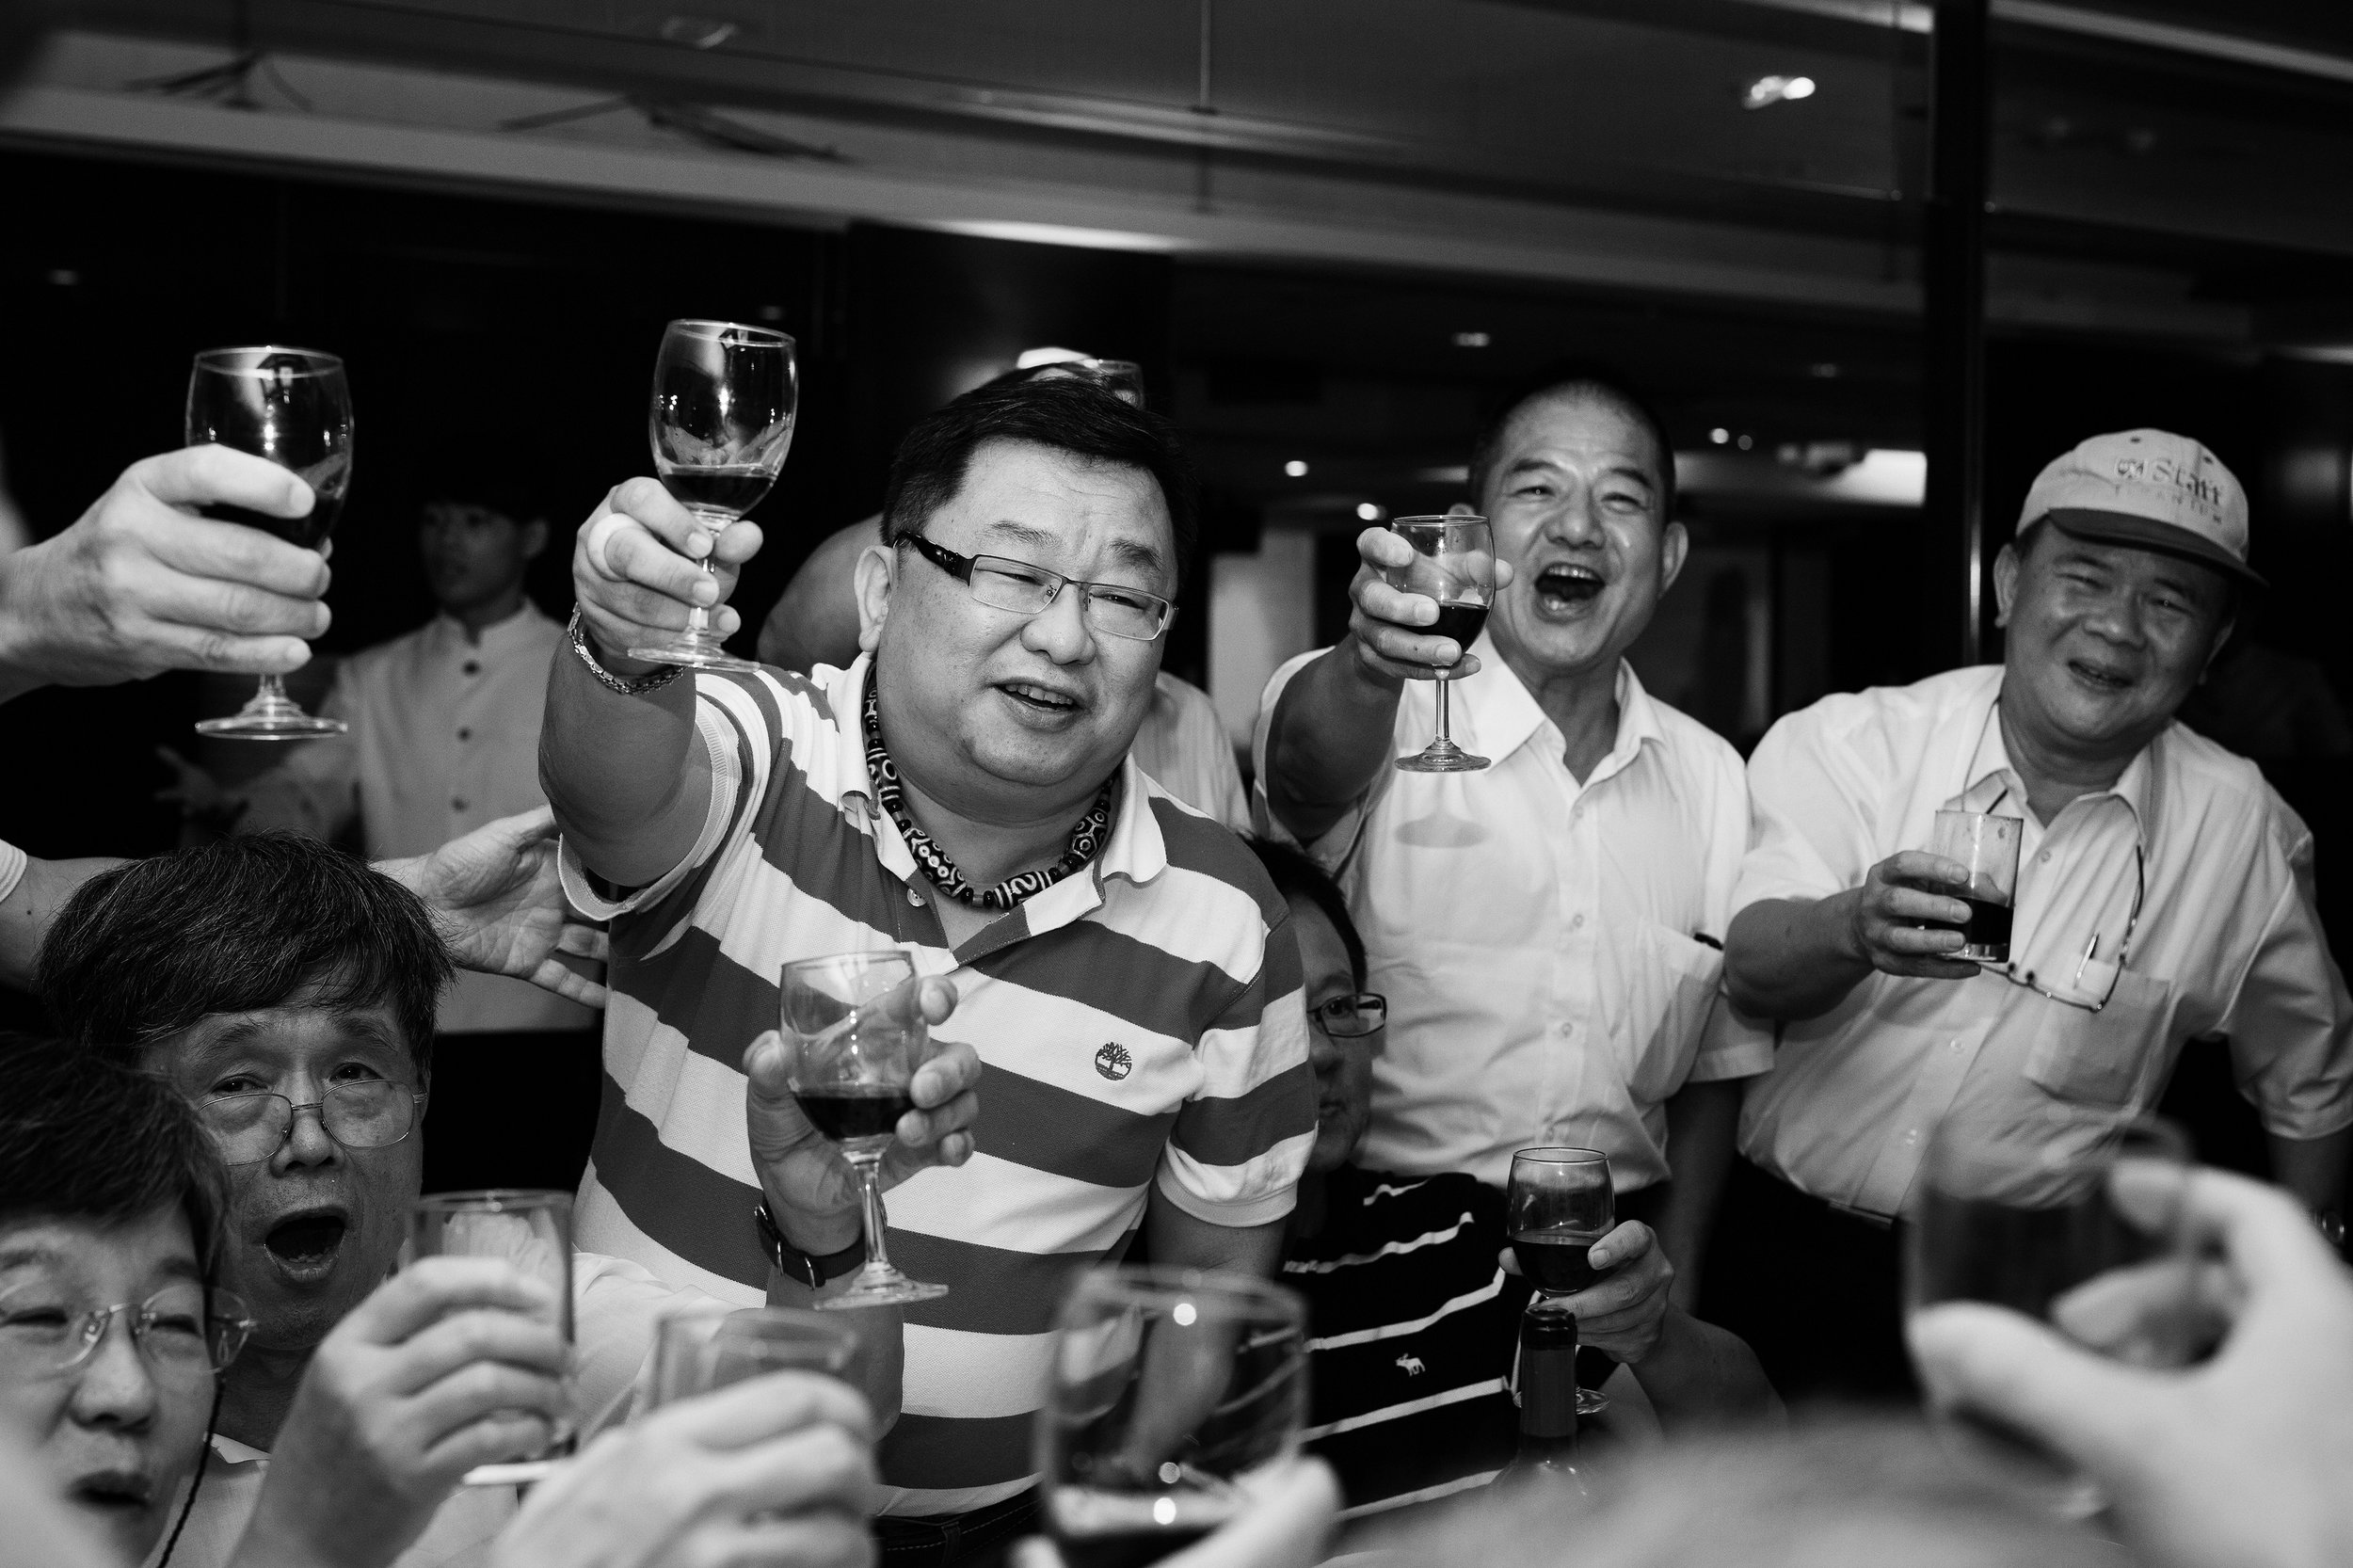 [JC]CREATIVE 女性攝影師 北投儷宴會館 補請台灣WEDDING    自然風格 台北婚攝推 女婚攝  桃園婚攝   圖像00327.JPG